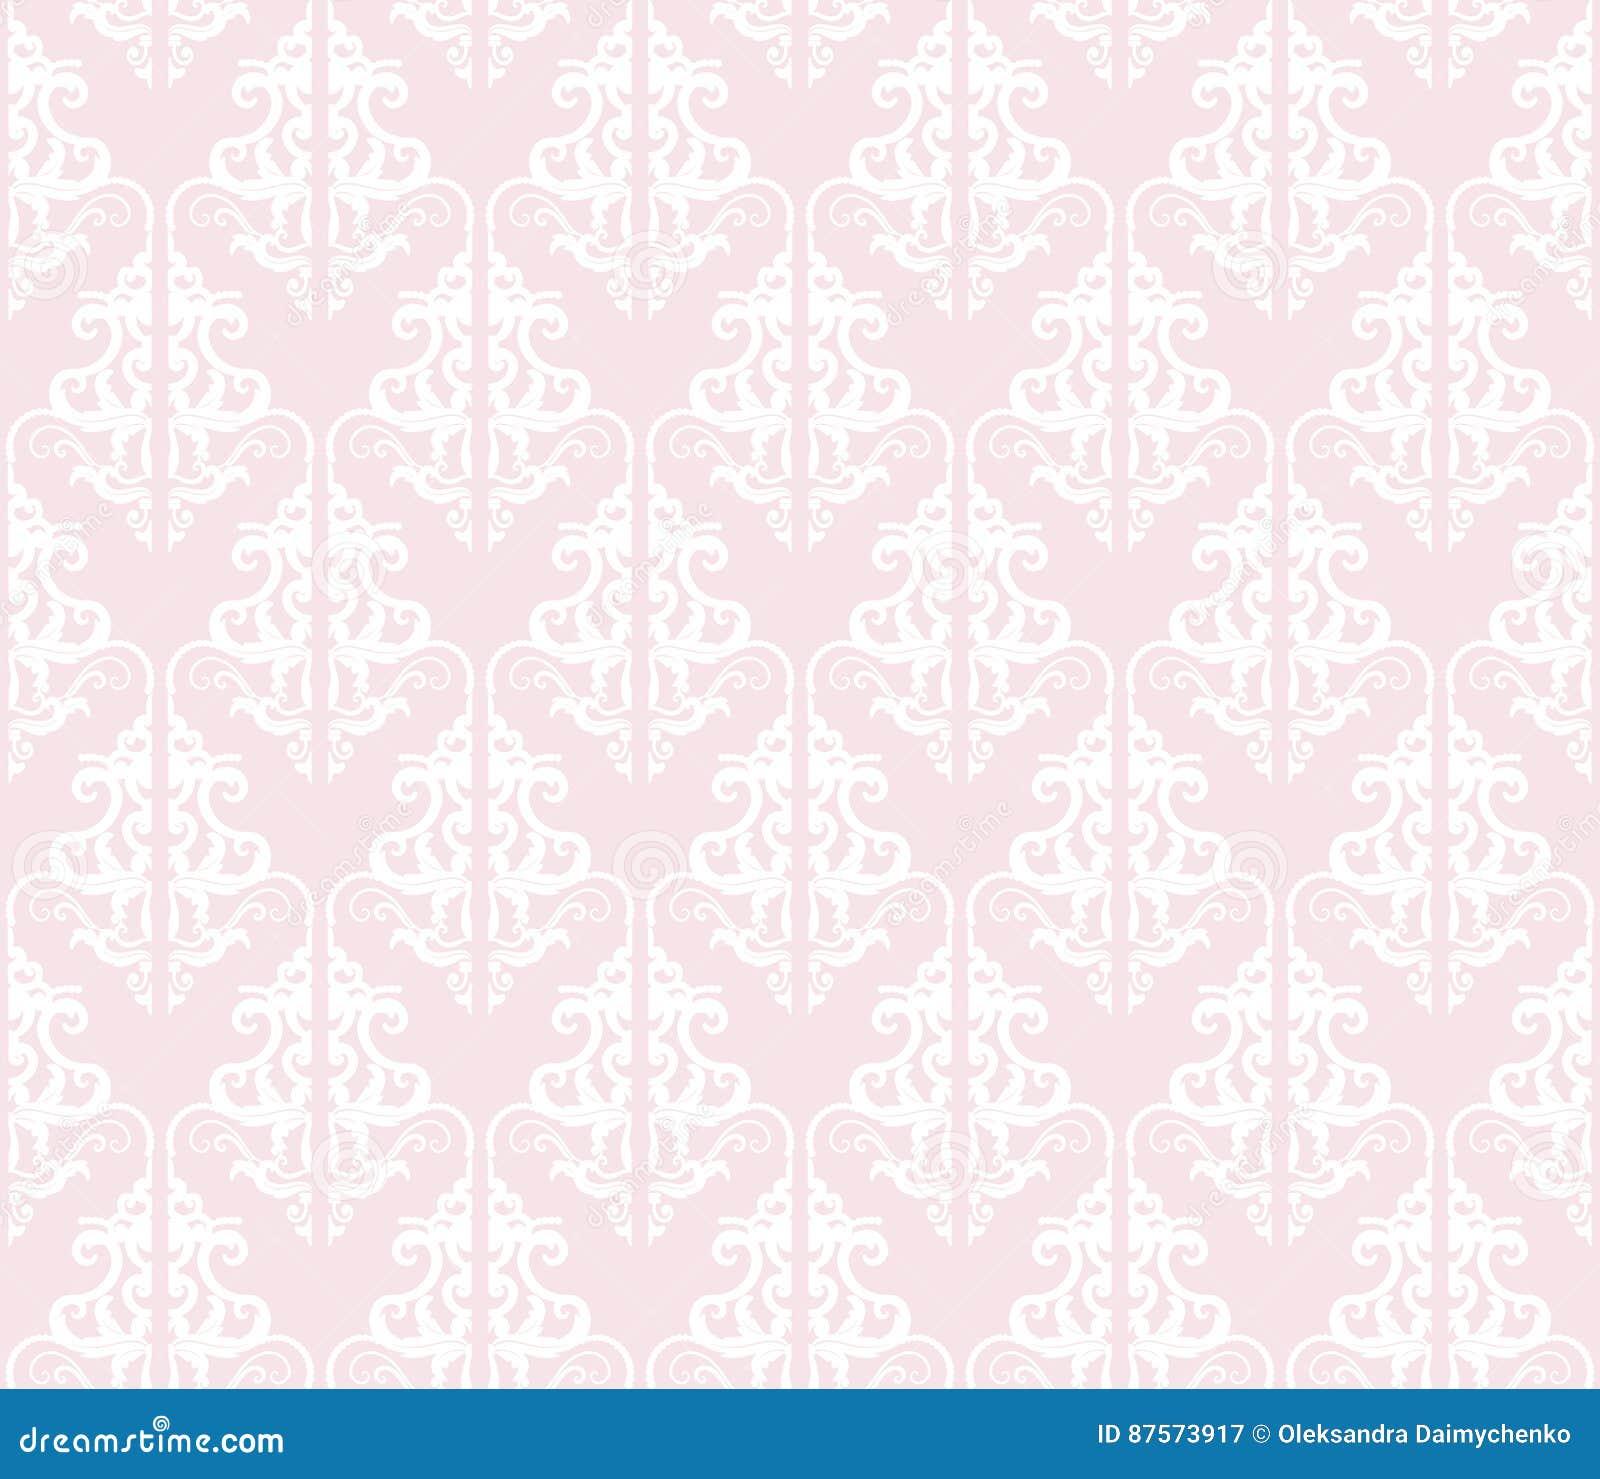 Damask Seamless Pattern Background Pastel Pink And White Vintage